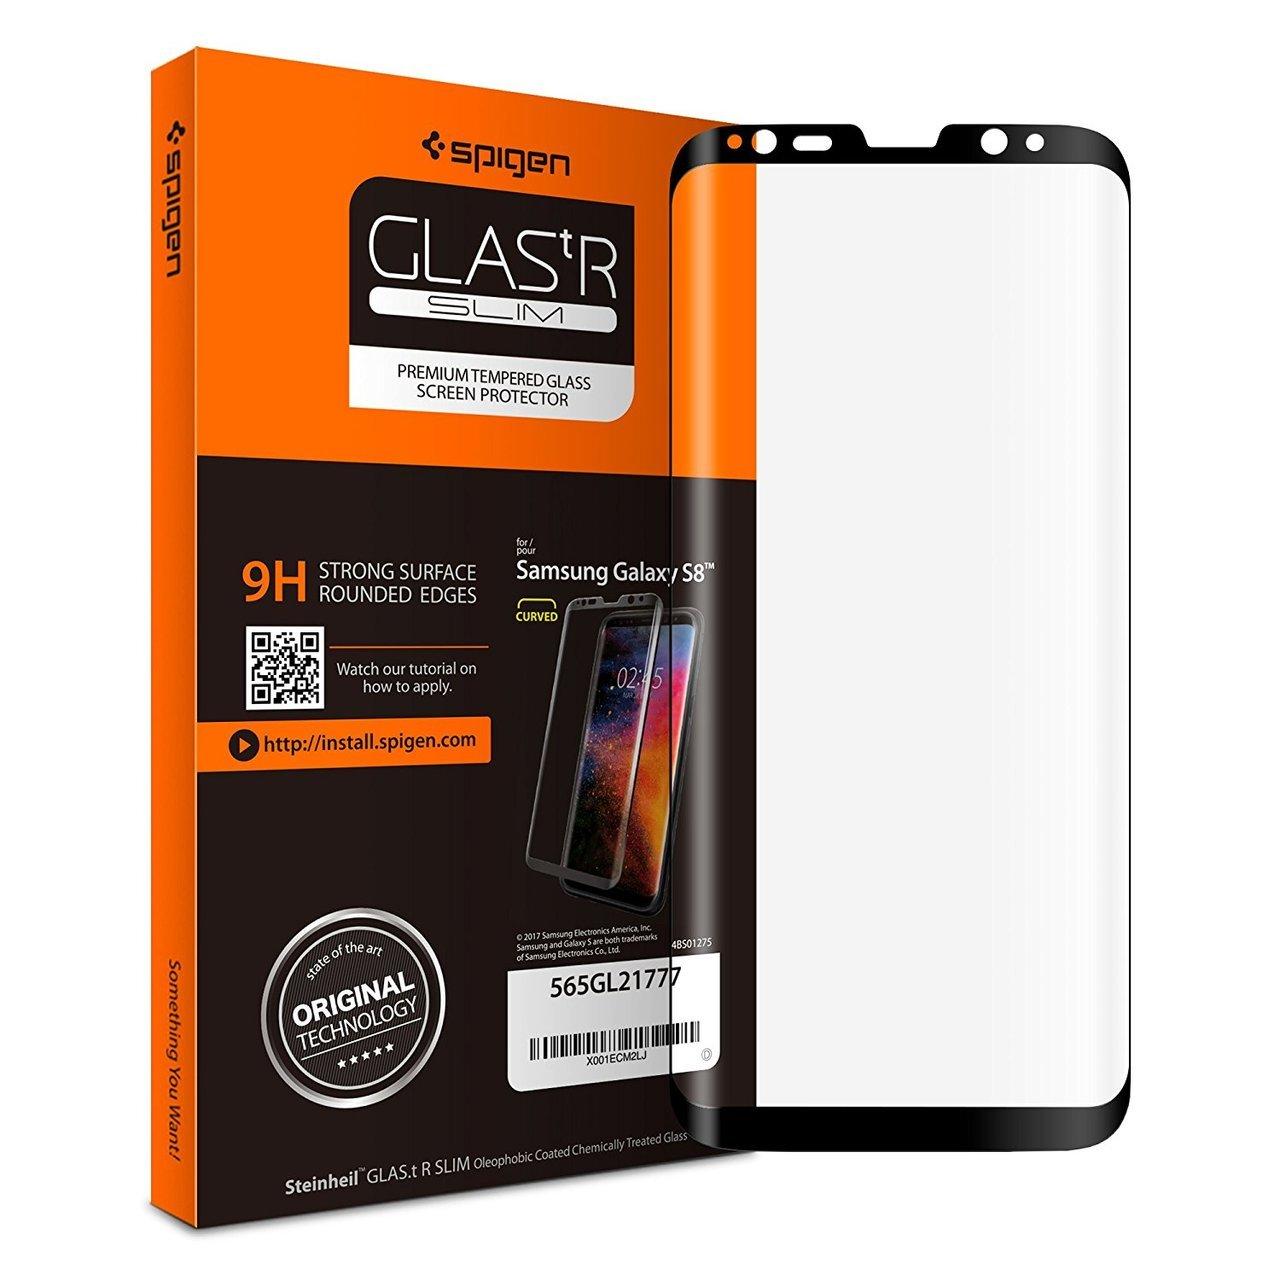 Galaxy S8 Spigen GLASTr Slim Case Friendly Curved Tempered Glass